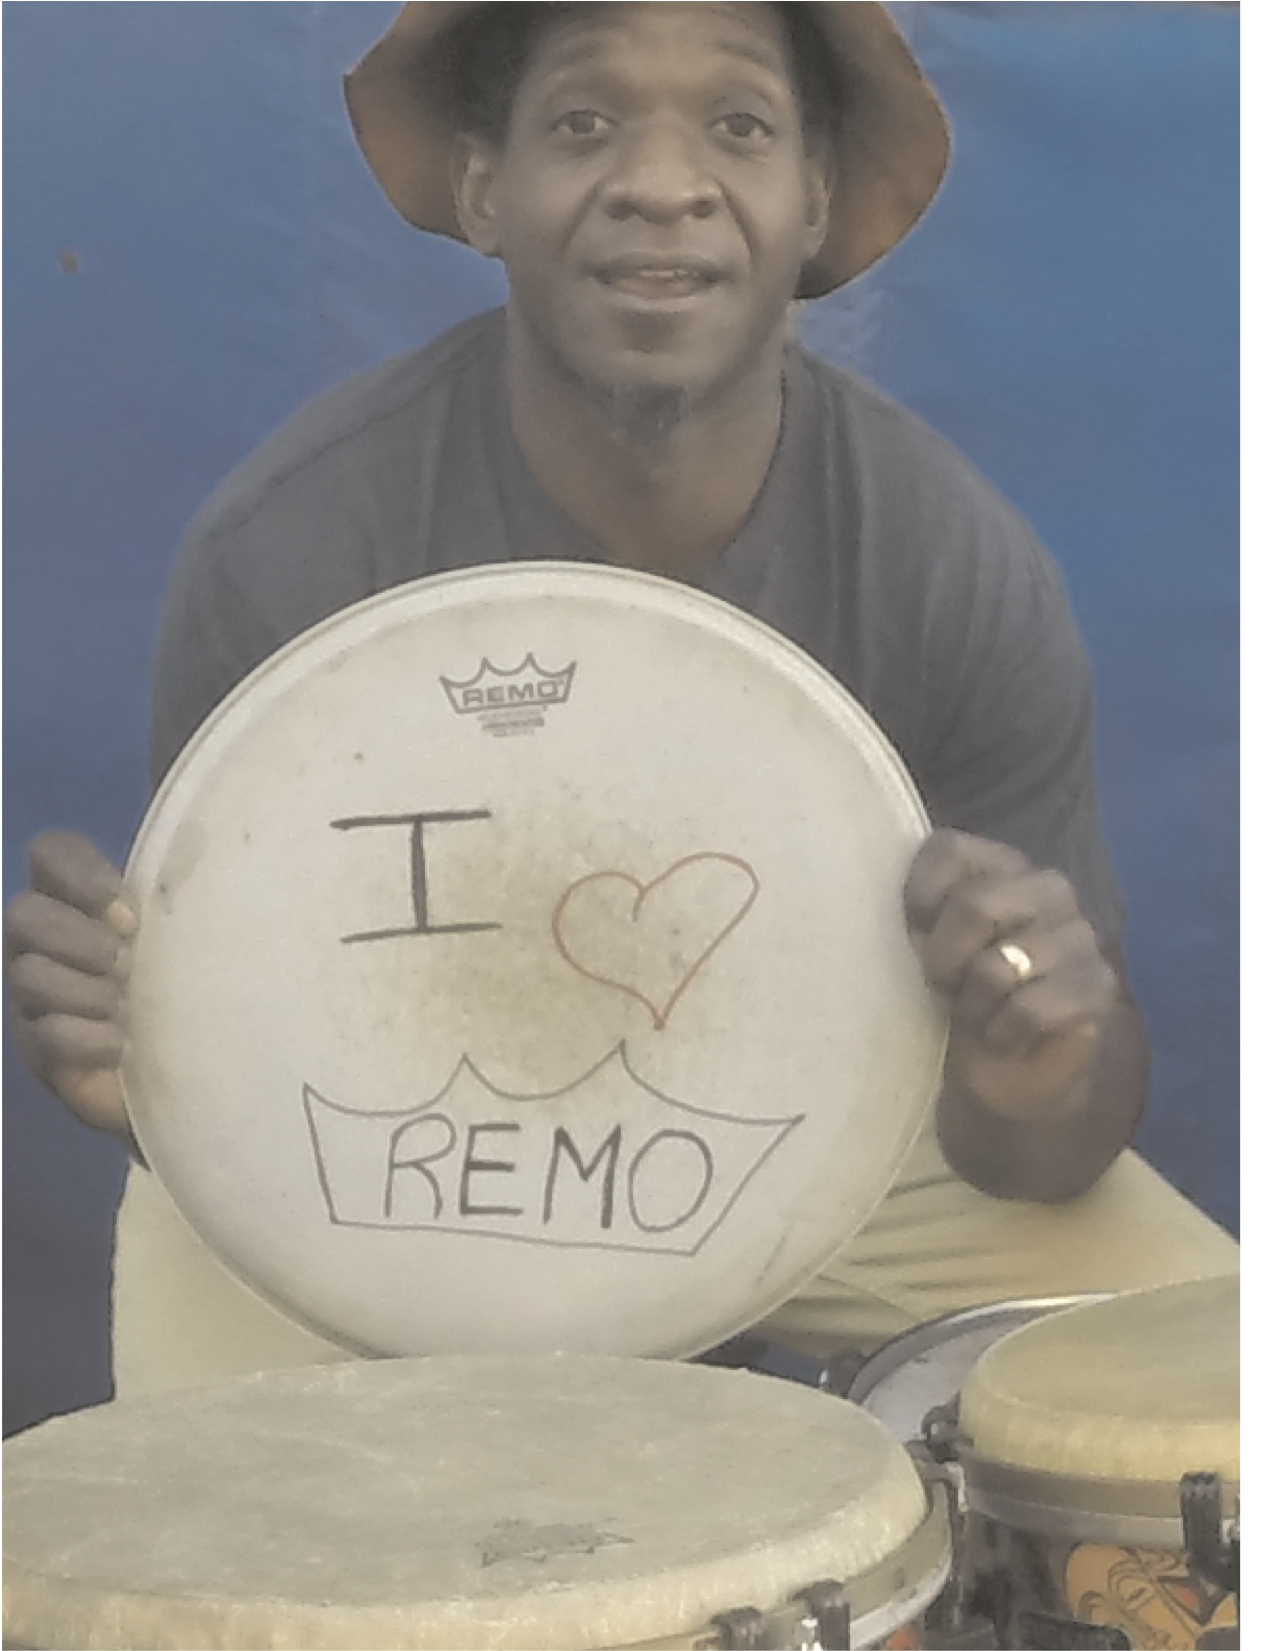 #TeamRemo forever